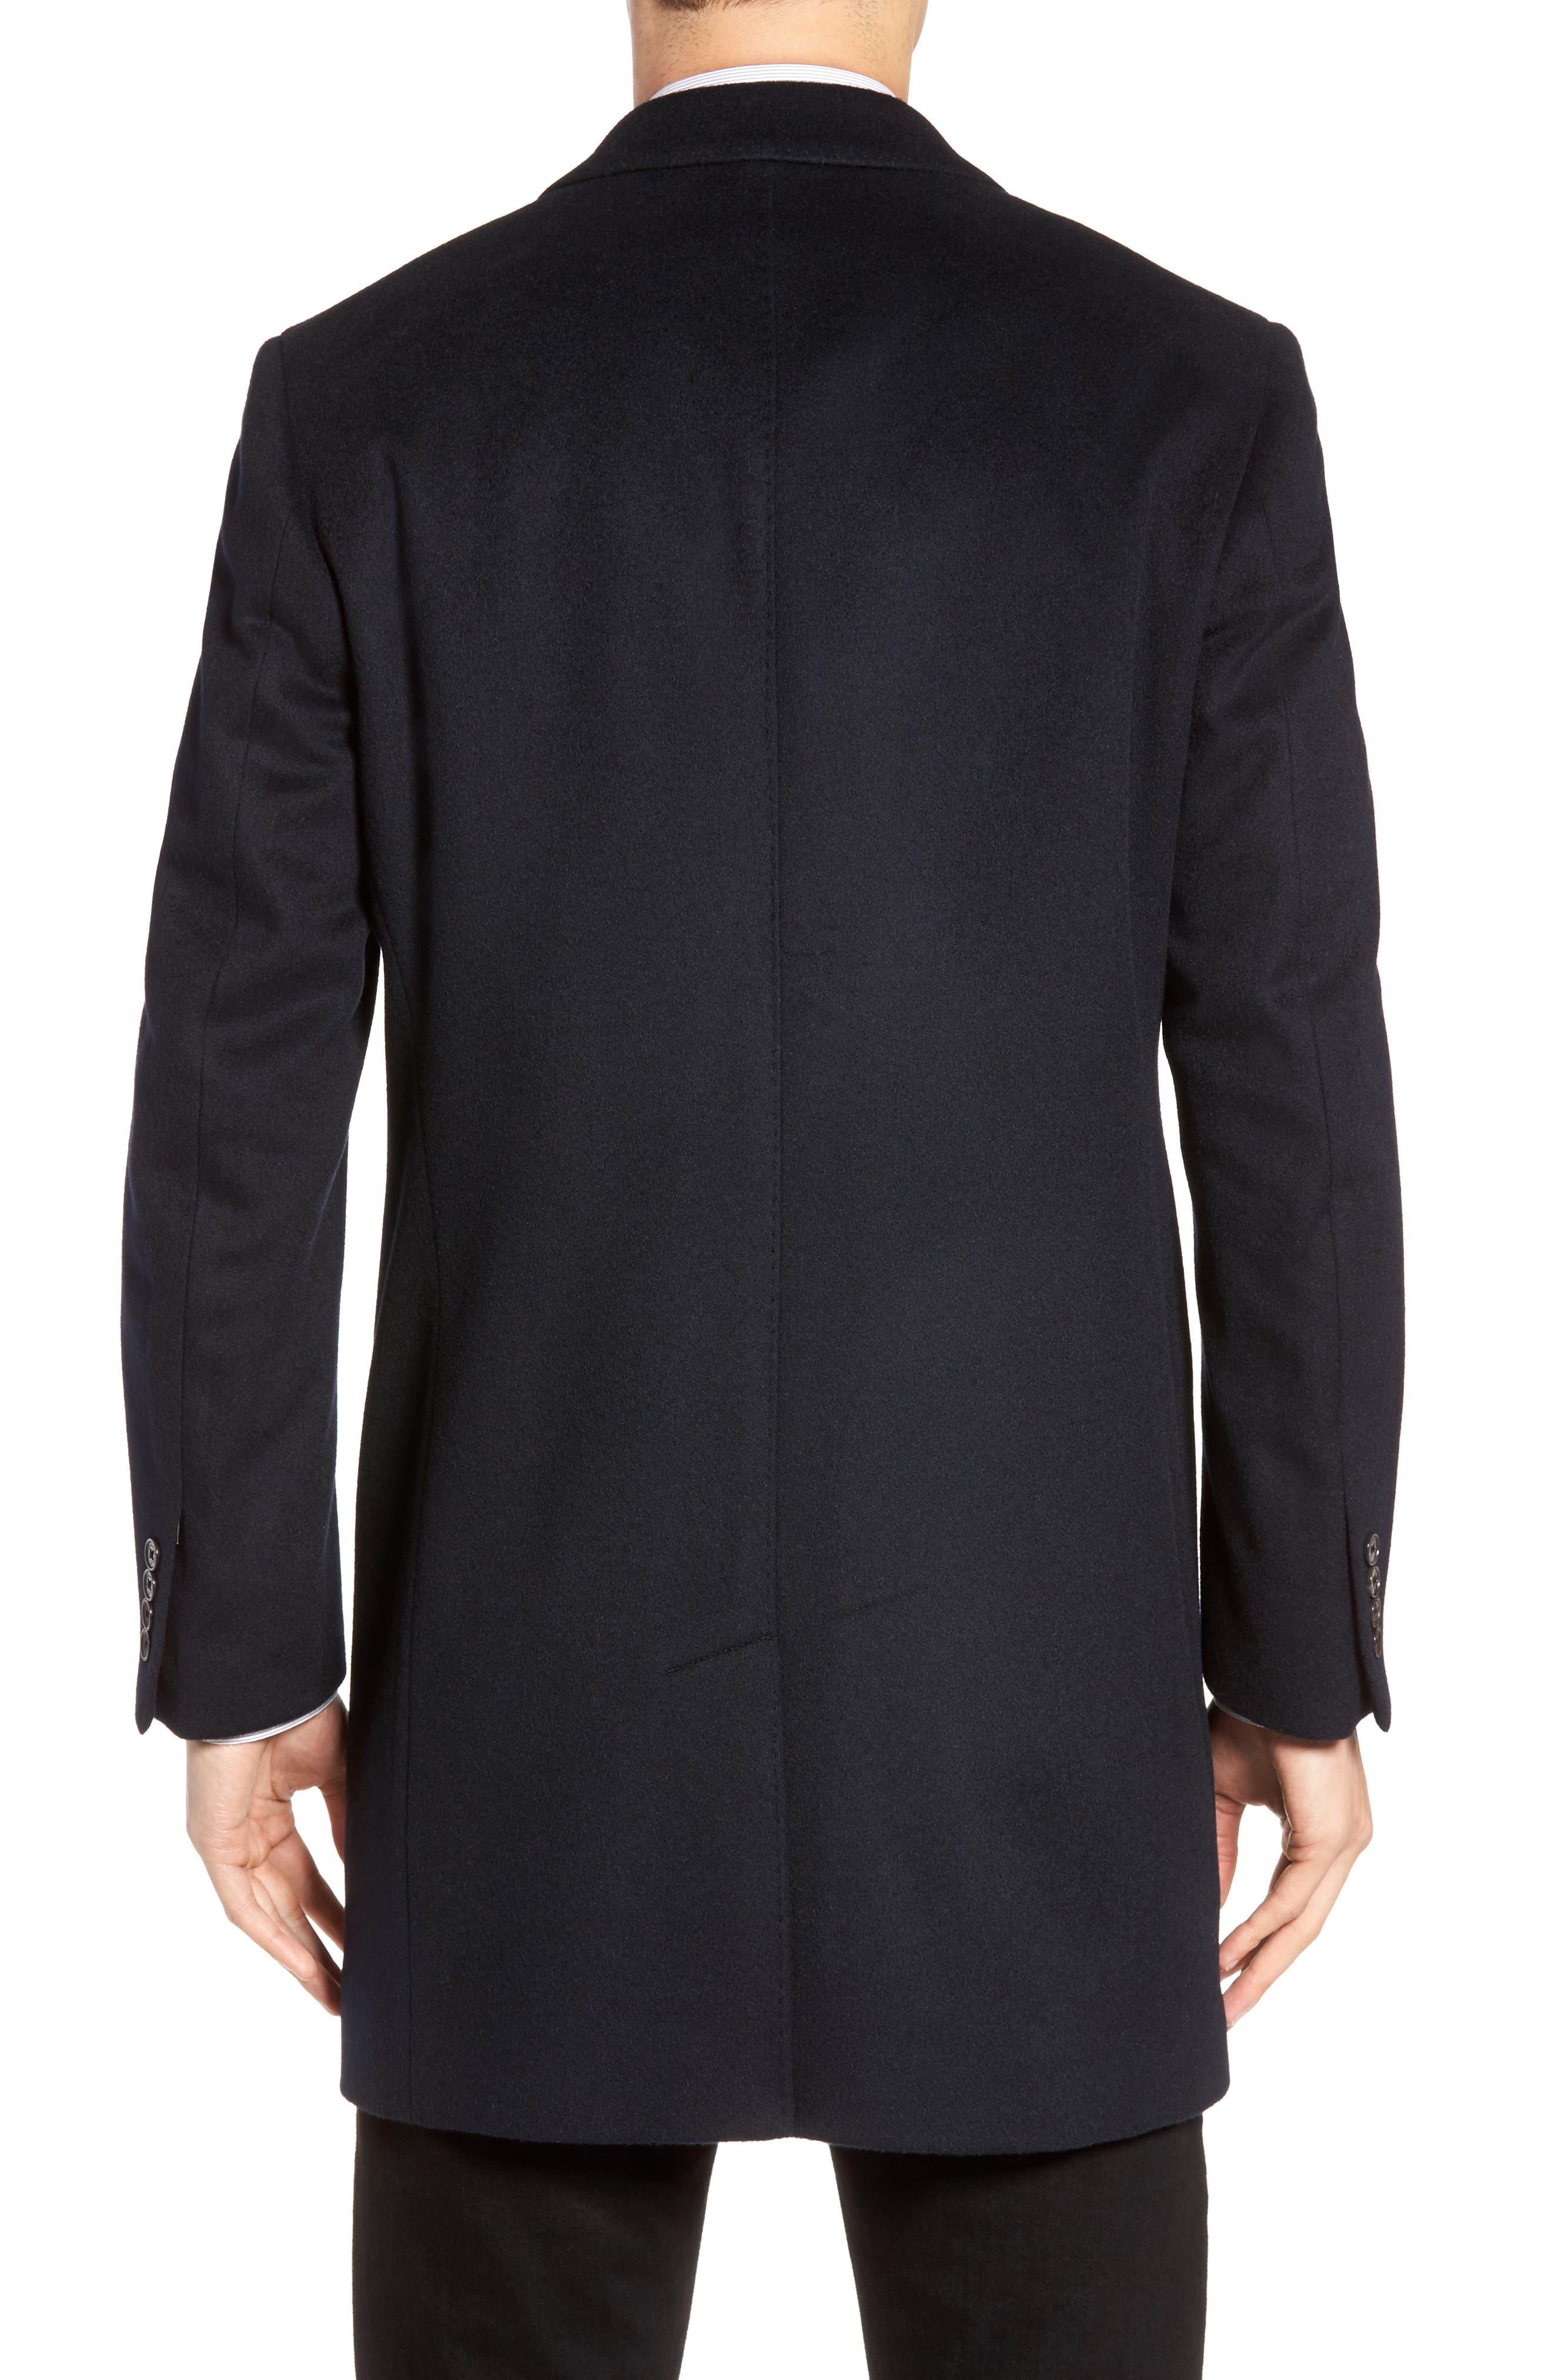 St. Paul Wool & Cashmere Topcoat,                             Alternate thumbnail 2, color,                             410